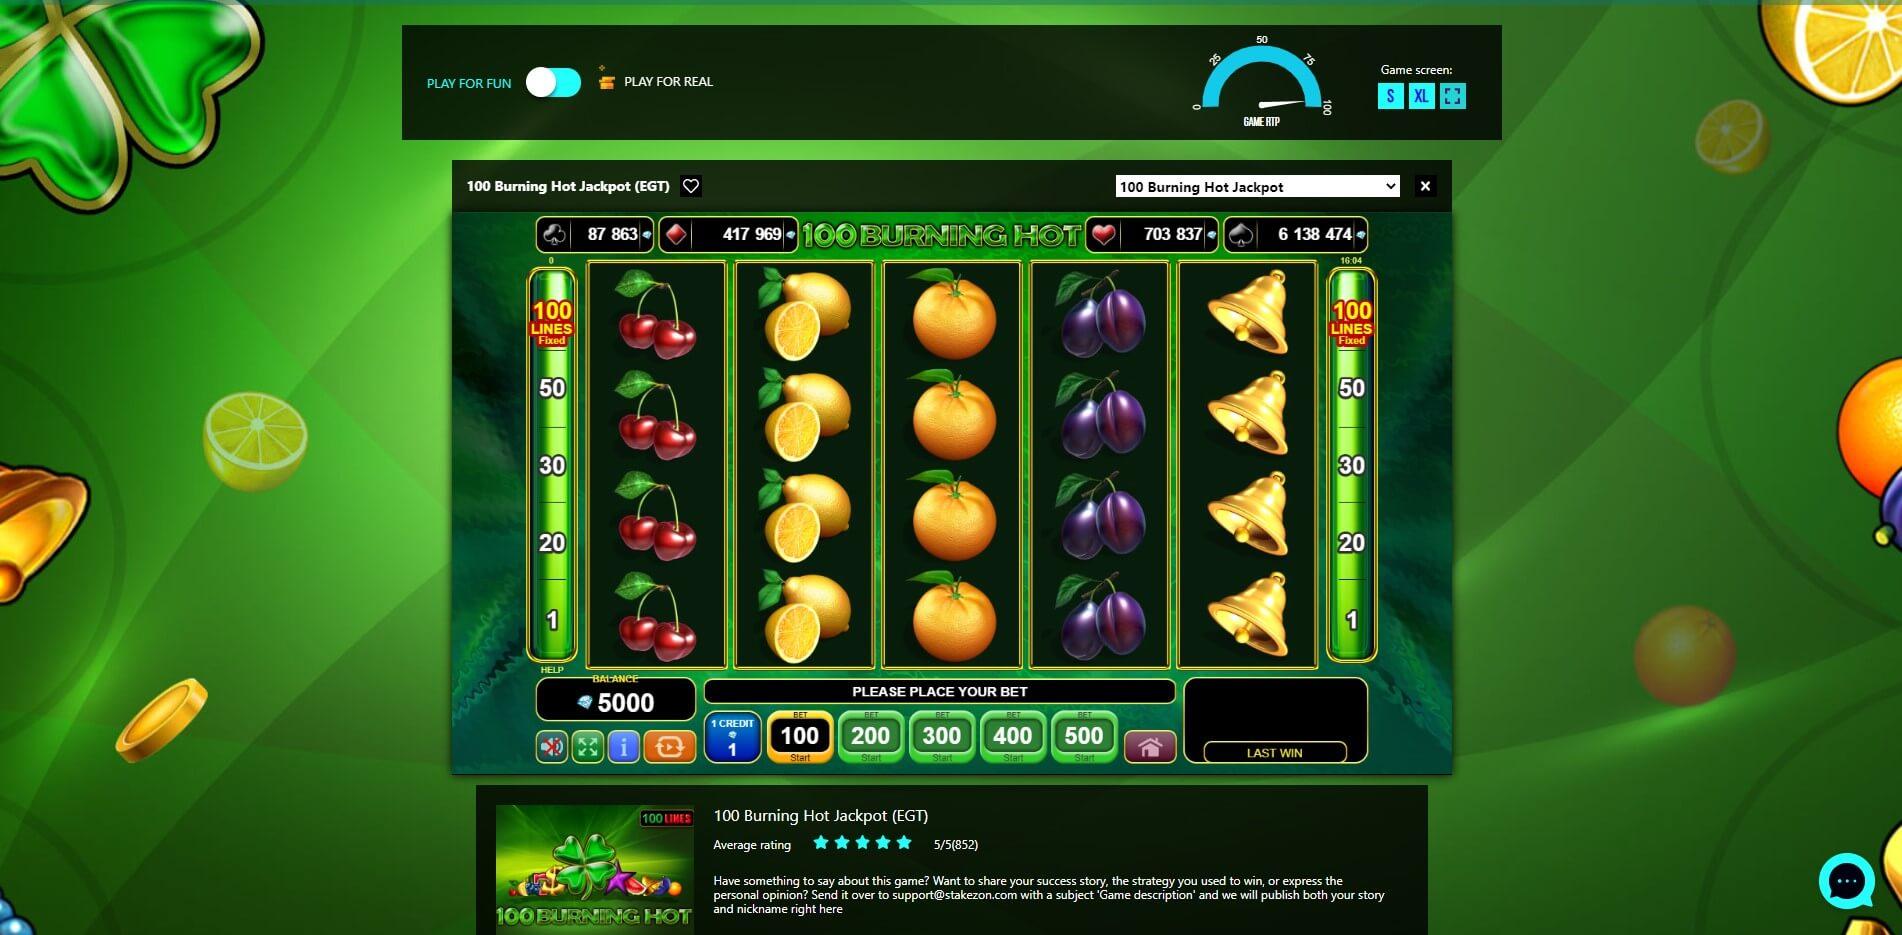 Game Play at Stakezon Casino